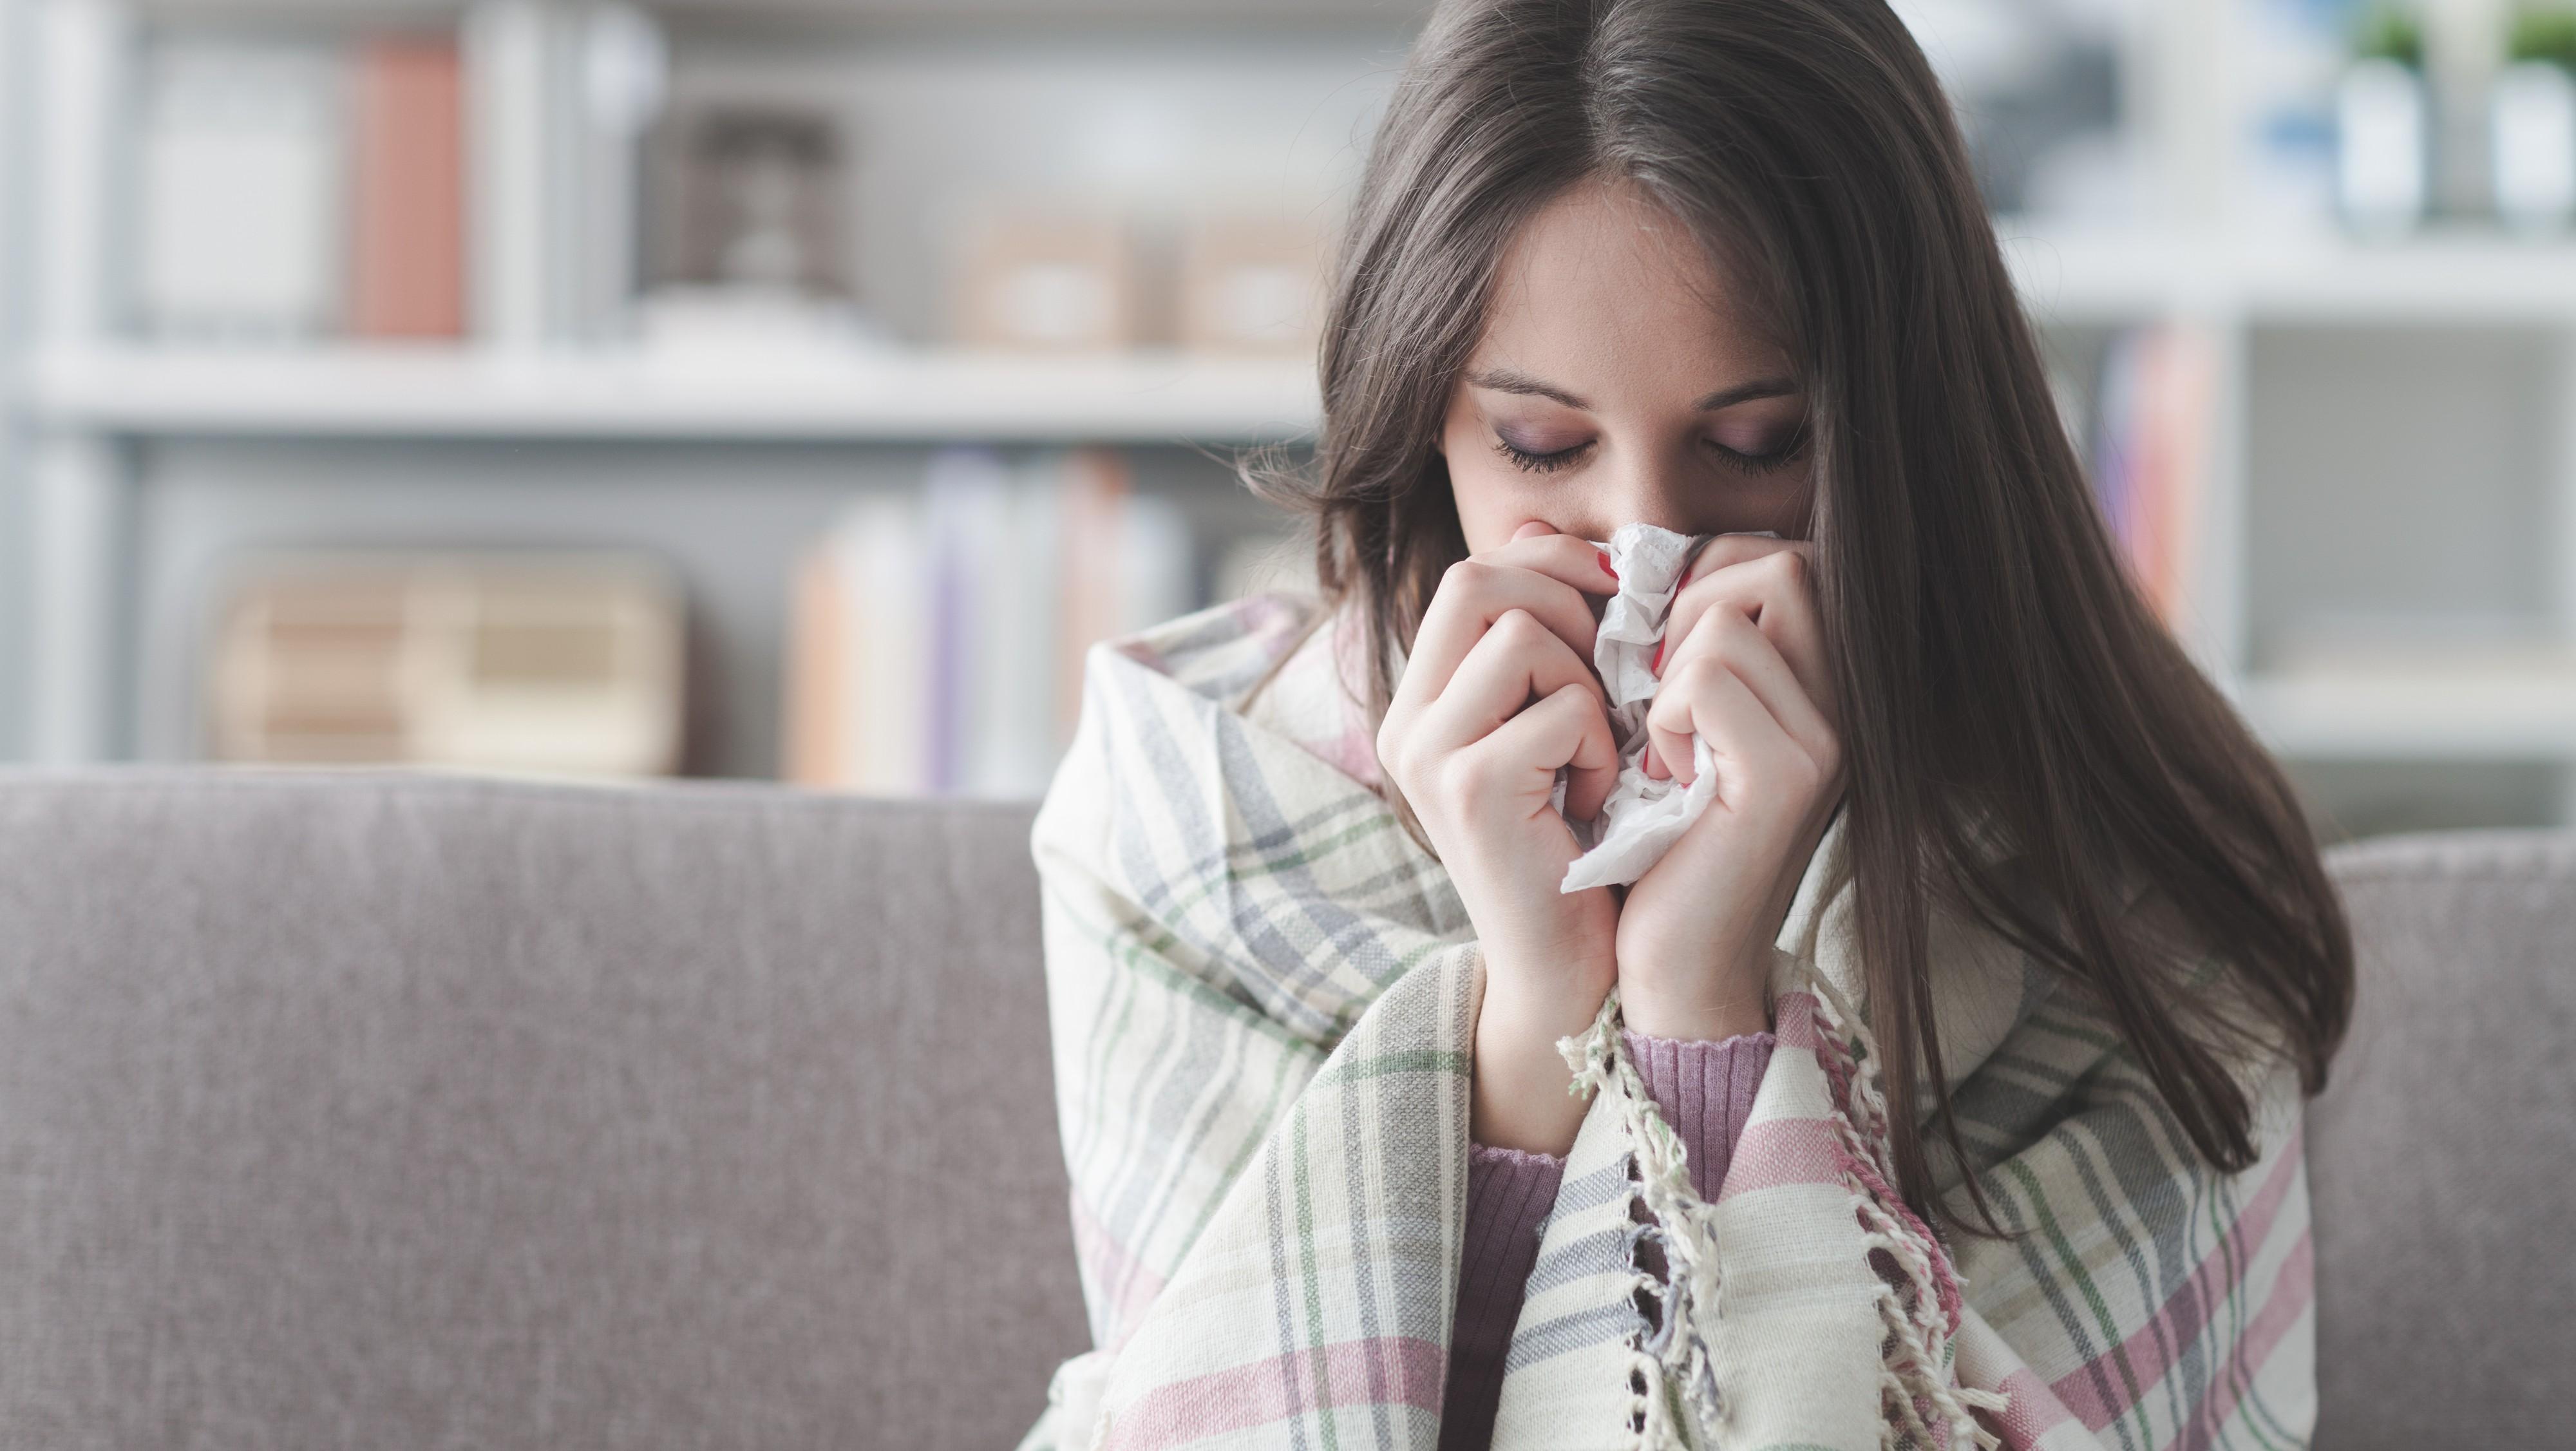 Husten, Fieber, Halsweh: Wann du lieber zuhause bleiben solltest